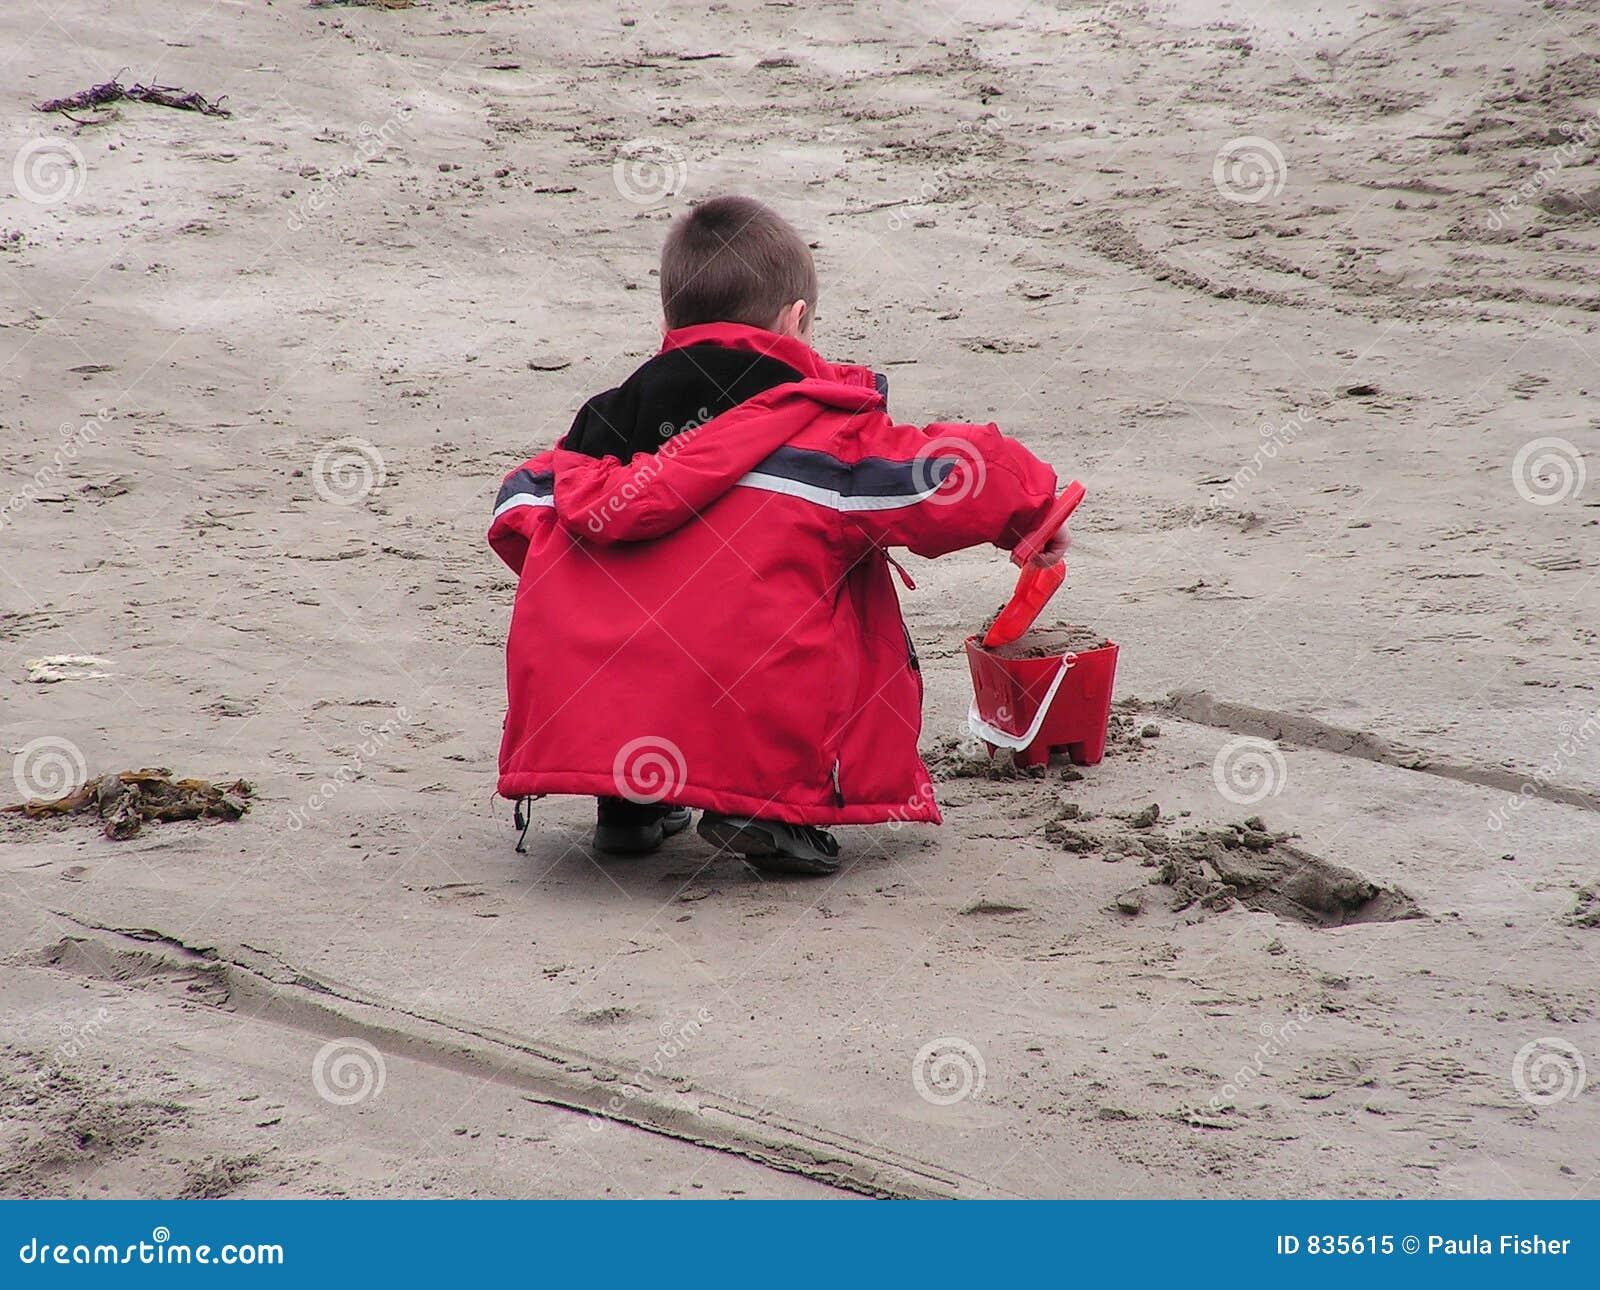 Child making sand castles